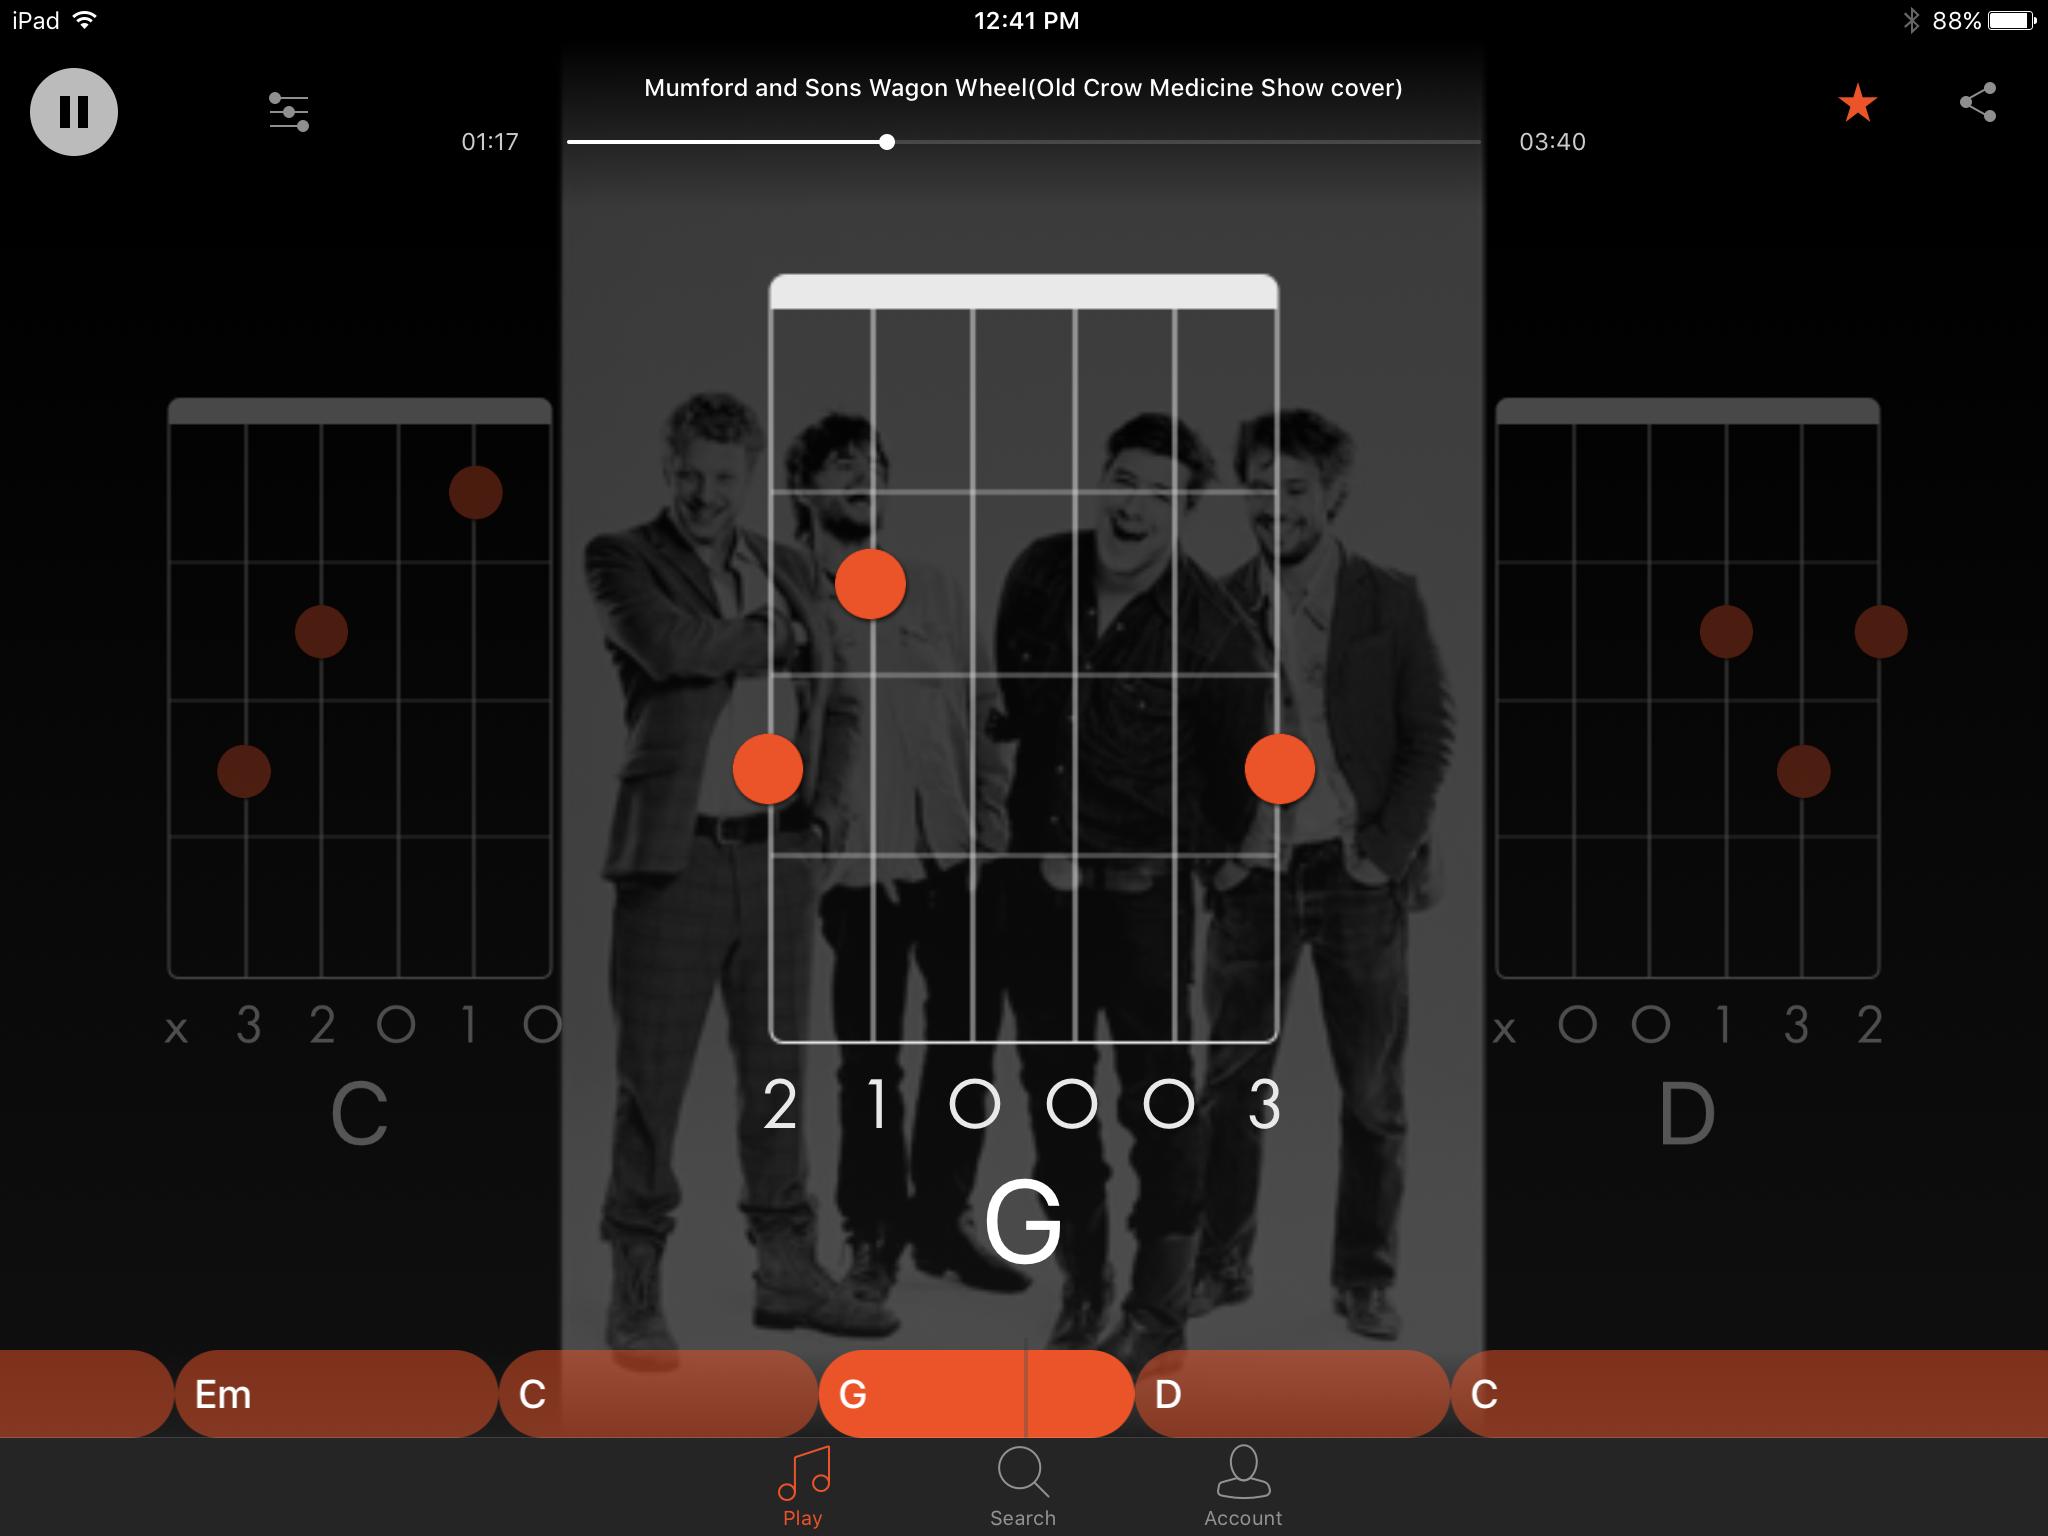 D String G Em C D Chords Guitar At Atu